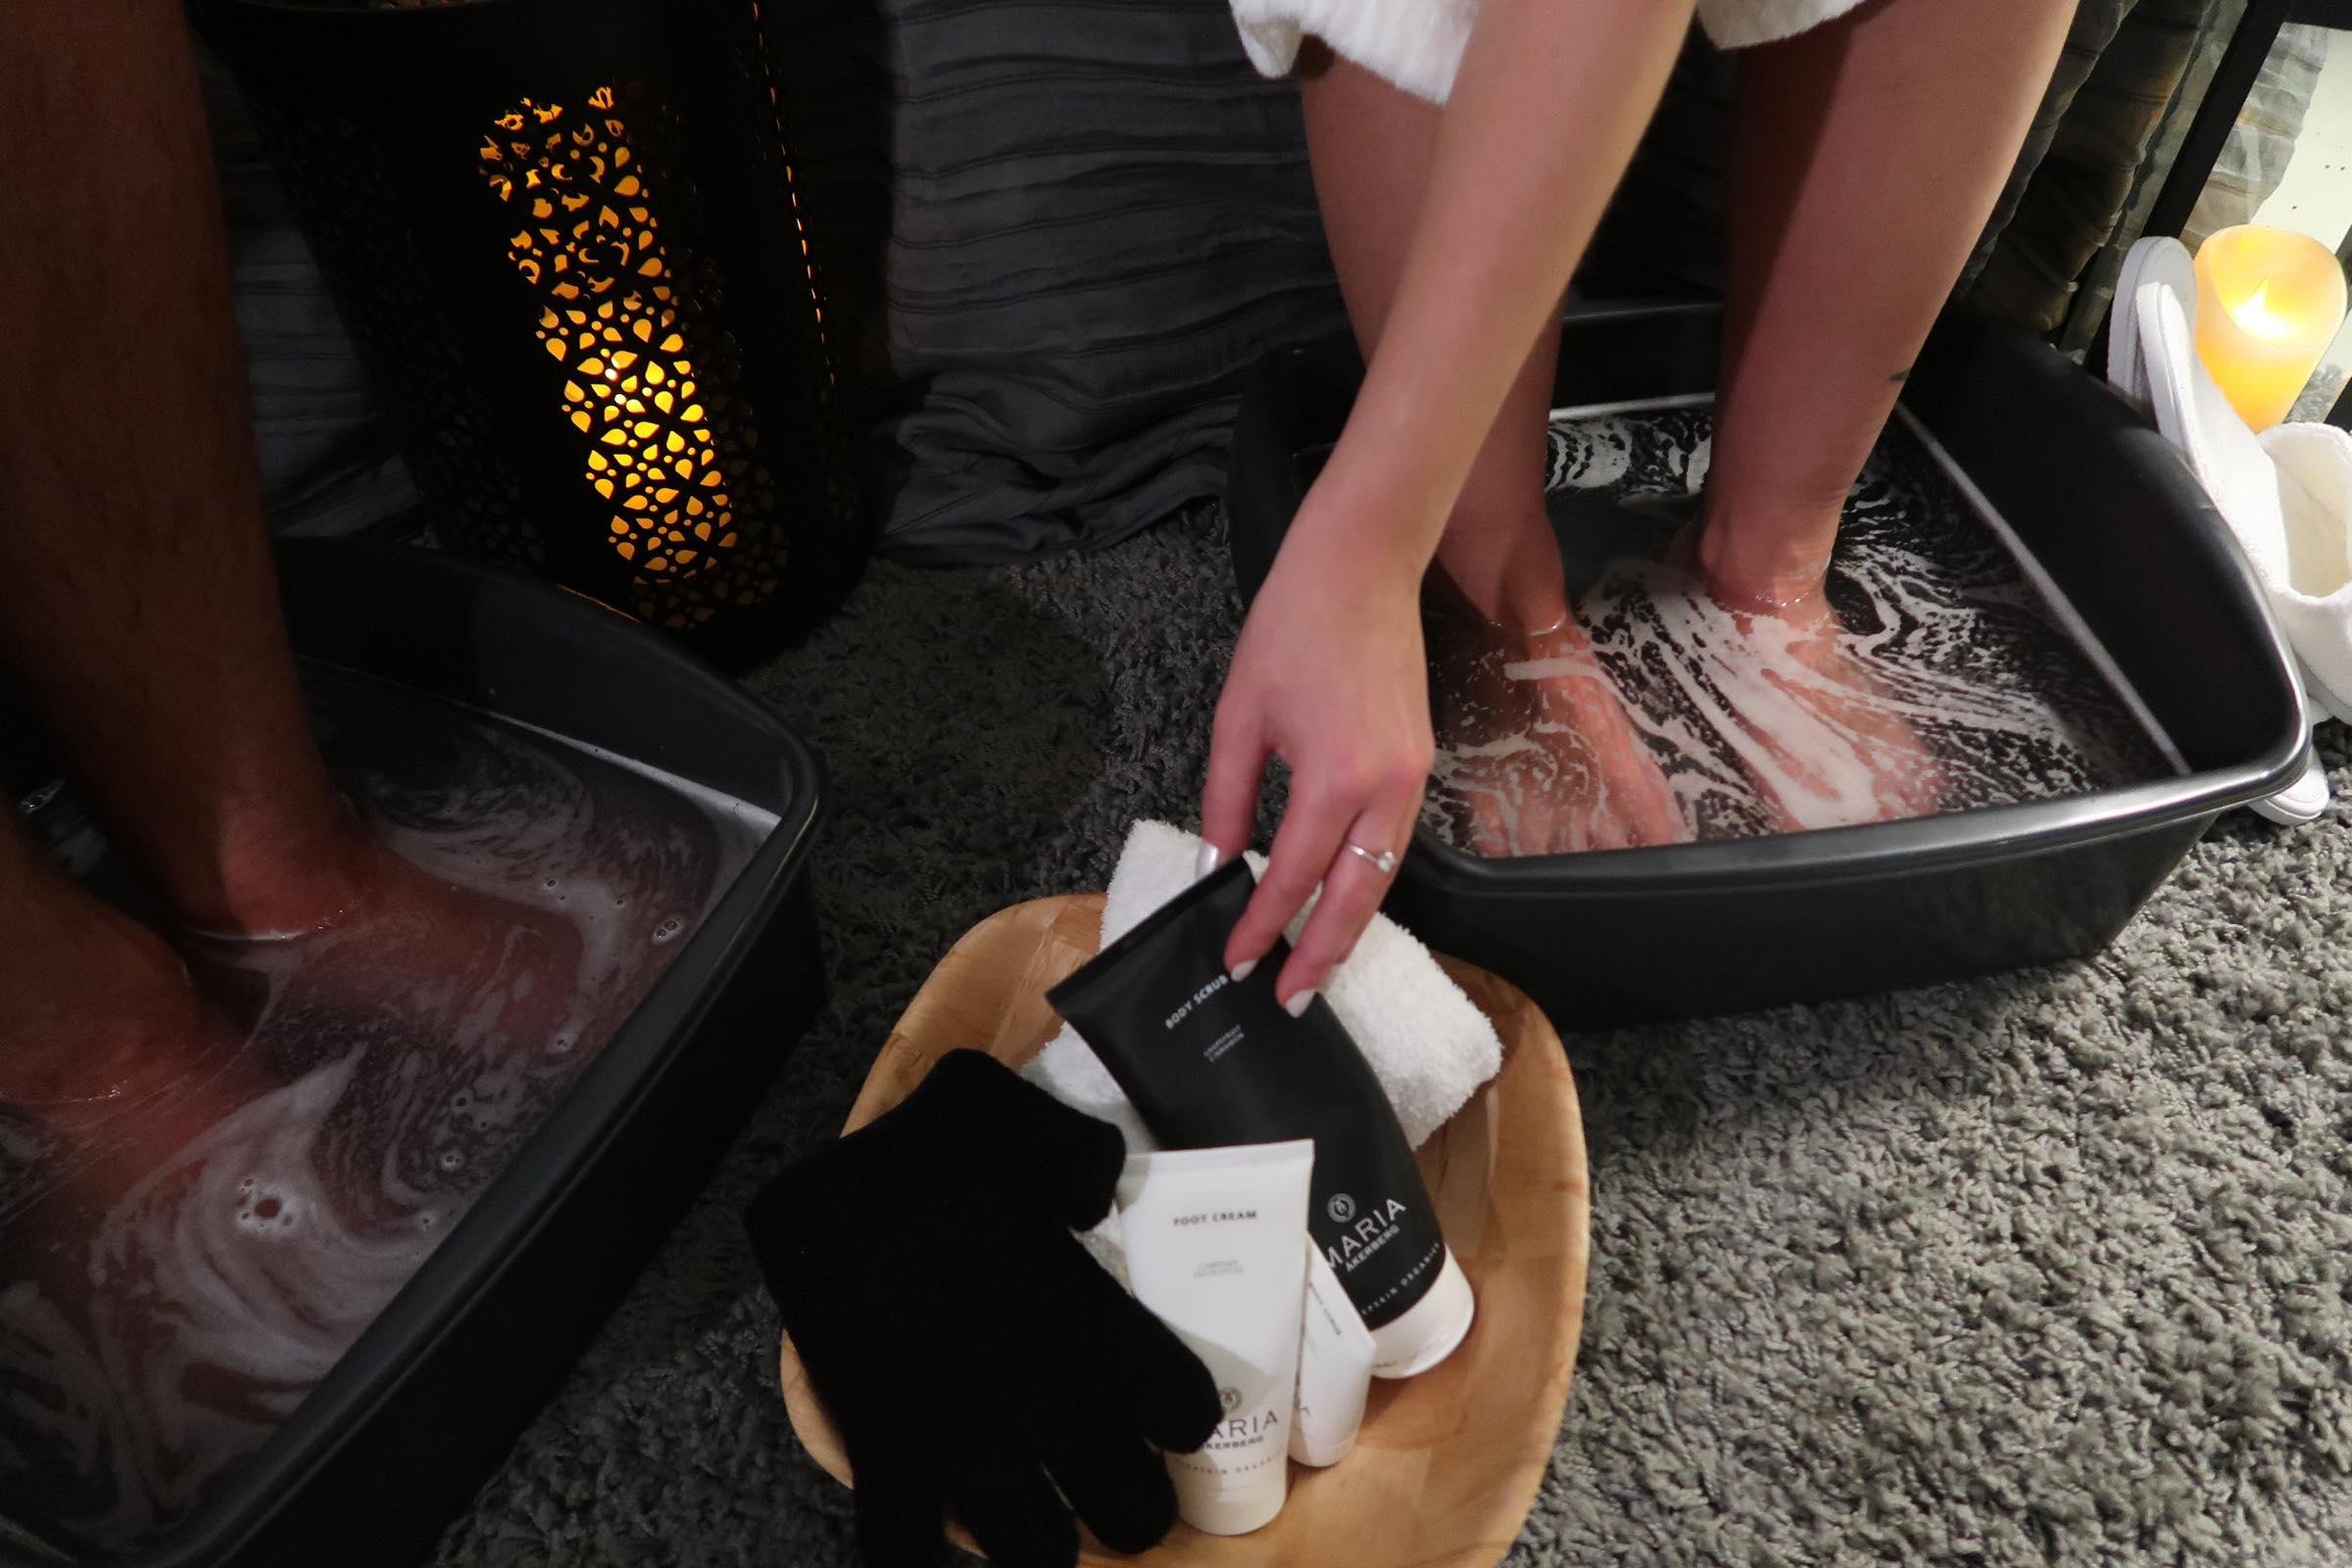 spa-behandling-Scrub-inpackning-erbjudande-massage-kungsholmen